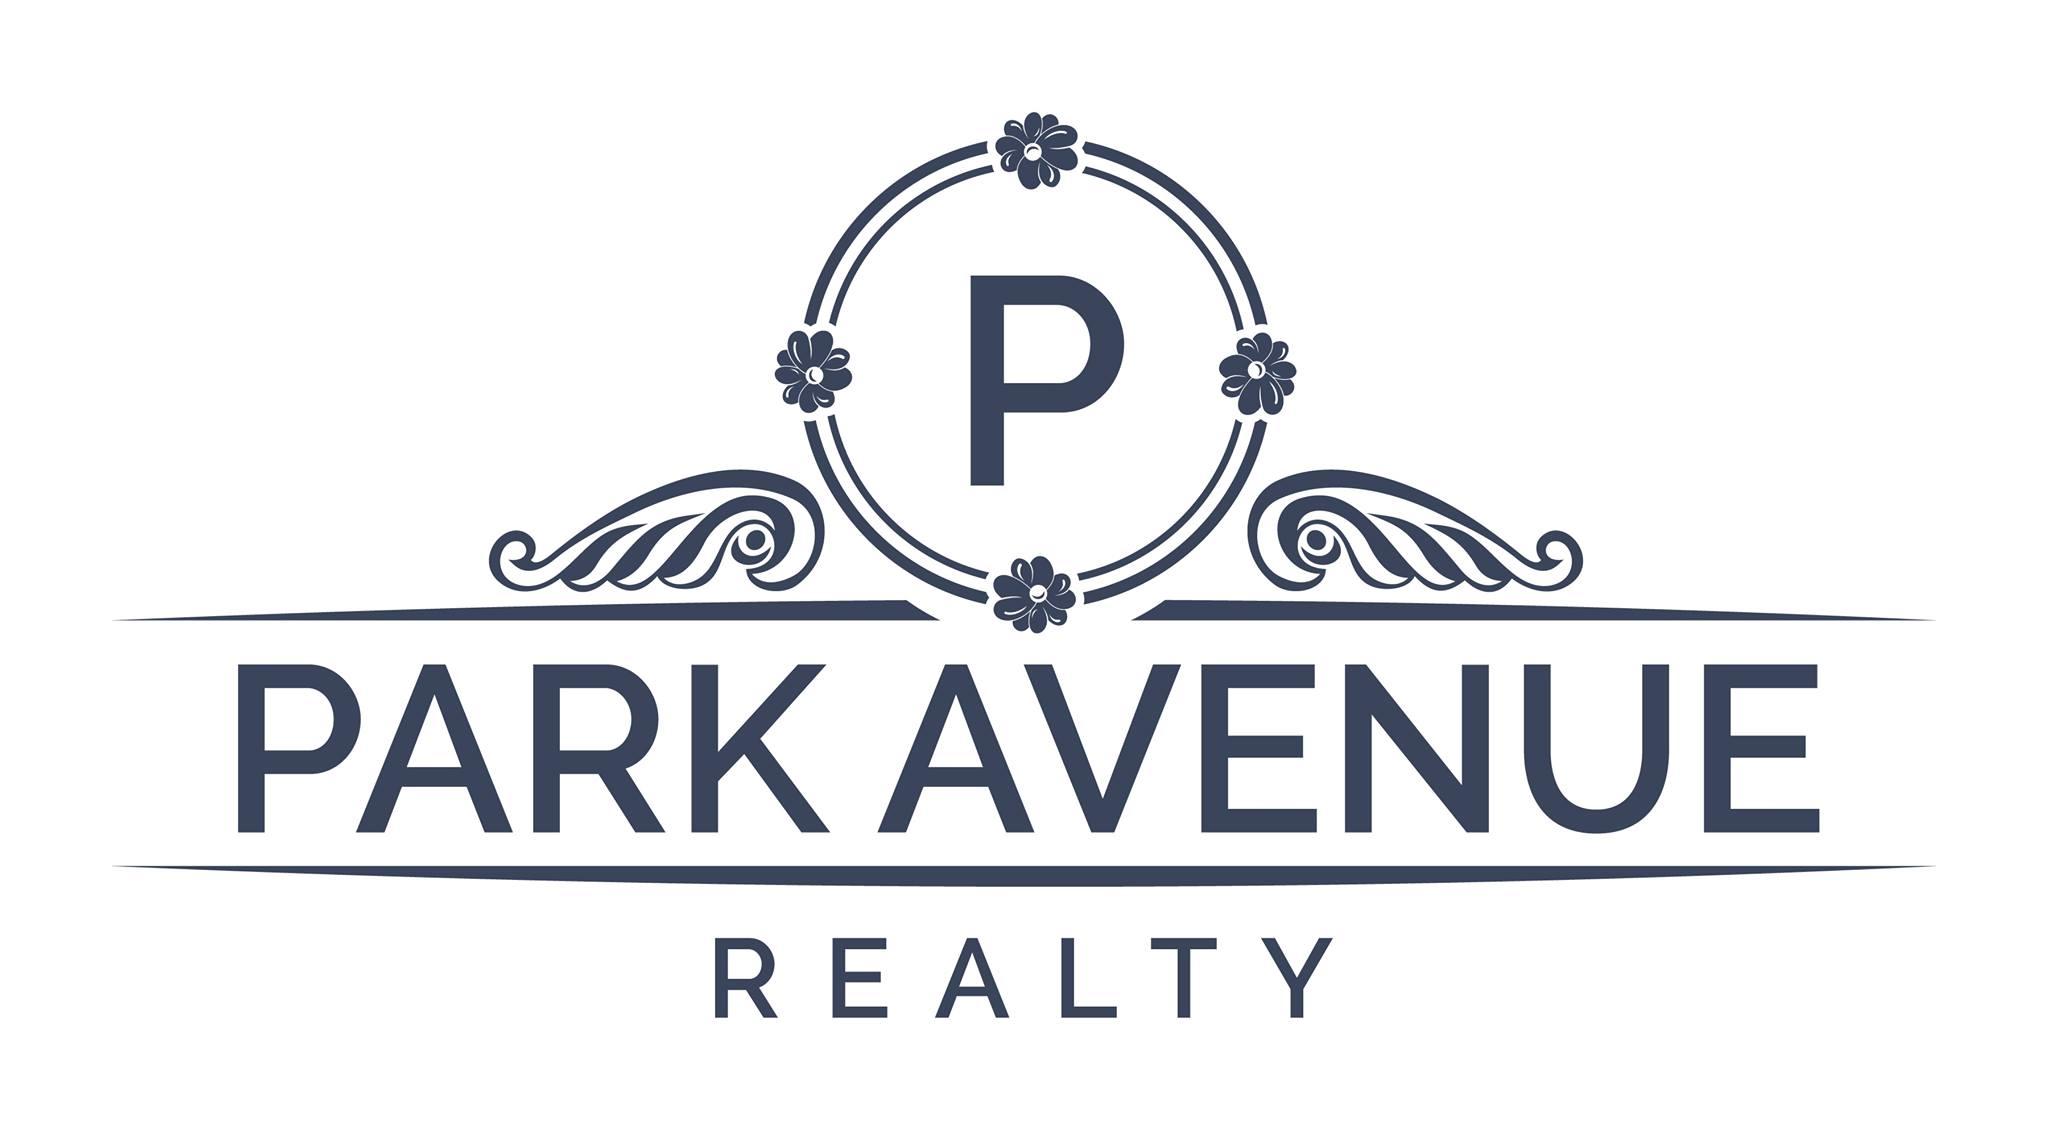 Park Avenue Realty LB's realty website